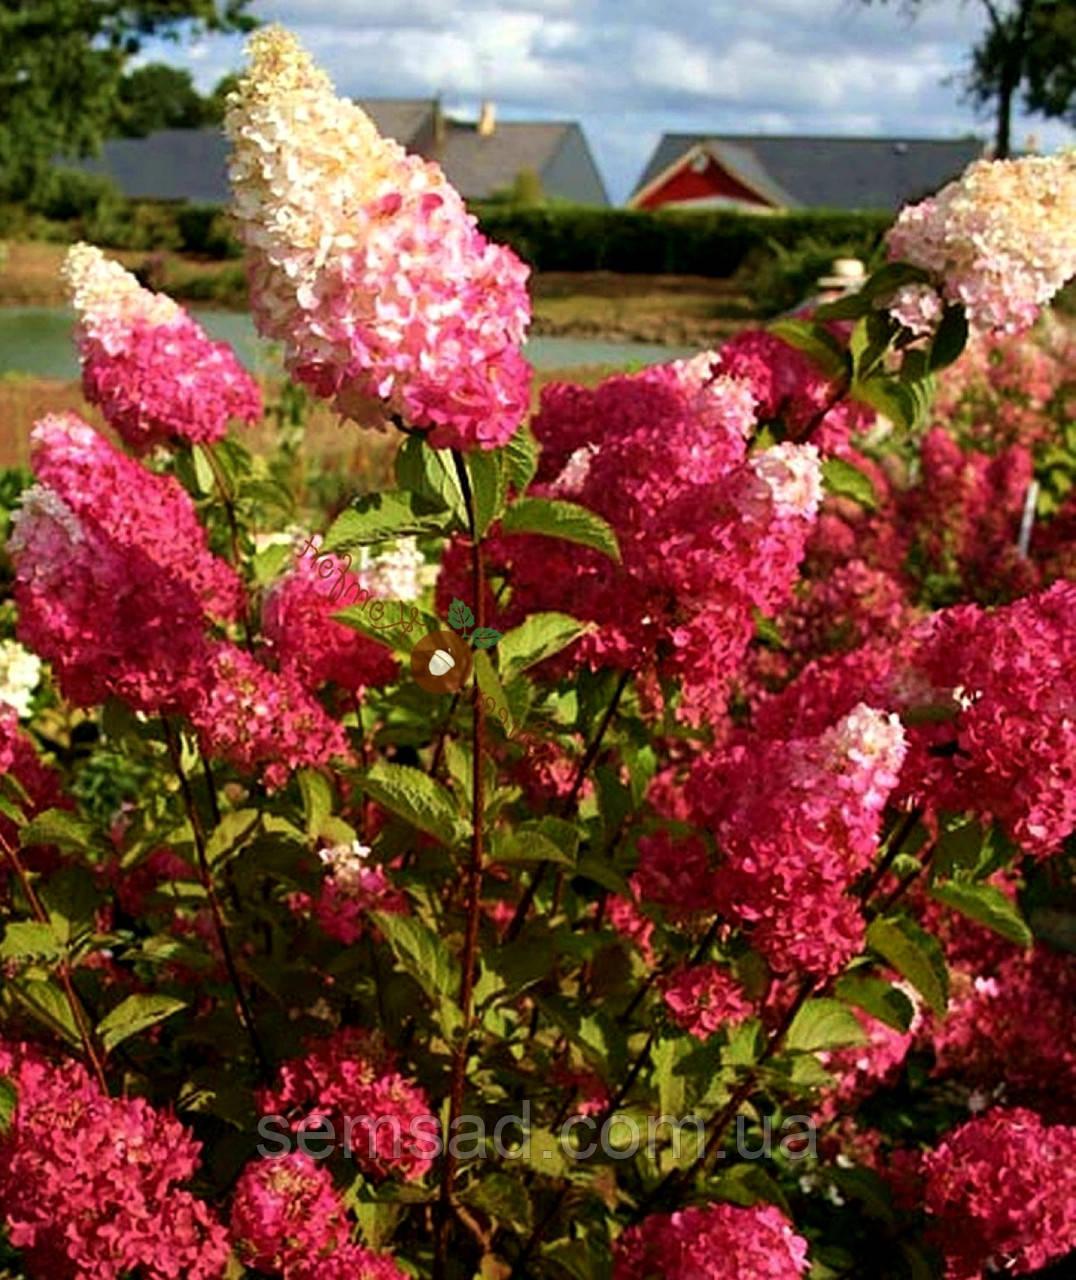 Гортензия метельчатая Фрайз Мельба \ Hydrangea paniculata Hydrangea  Fraise Melba ( саженцы 2 год)